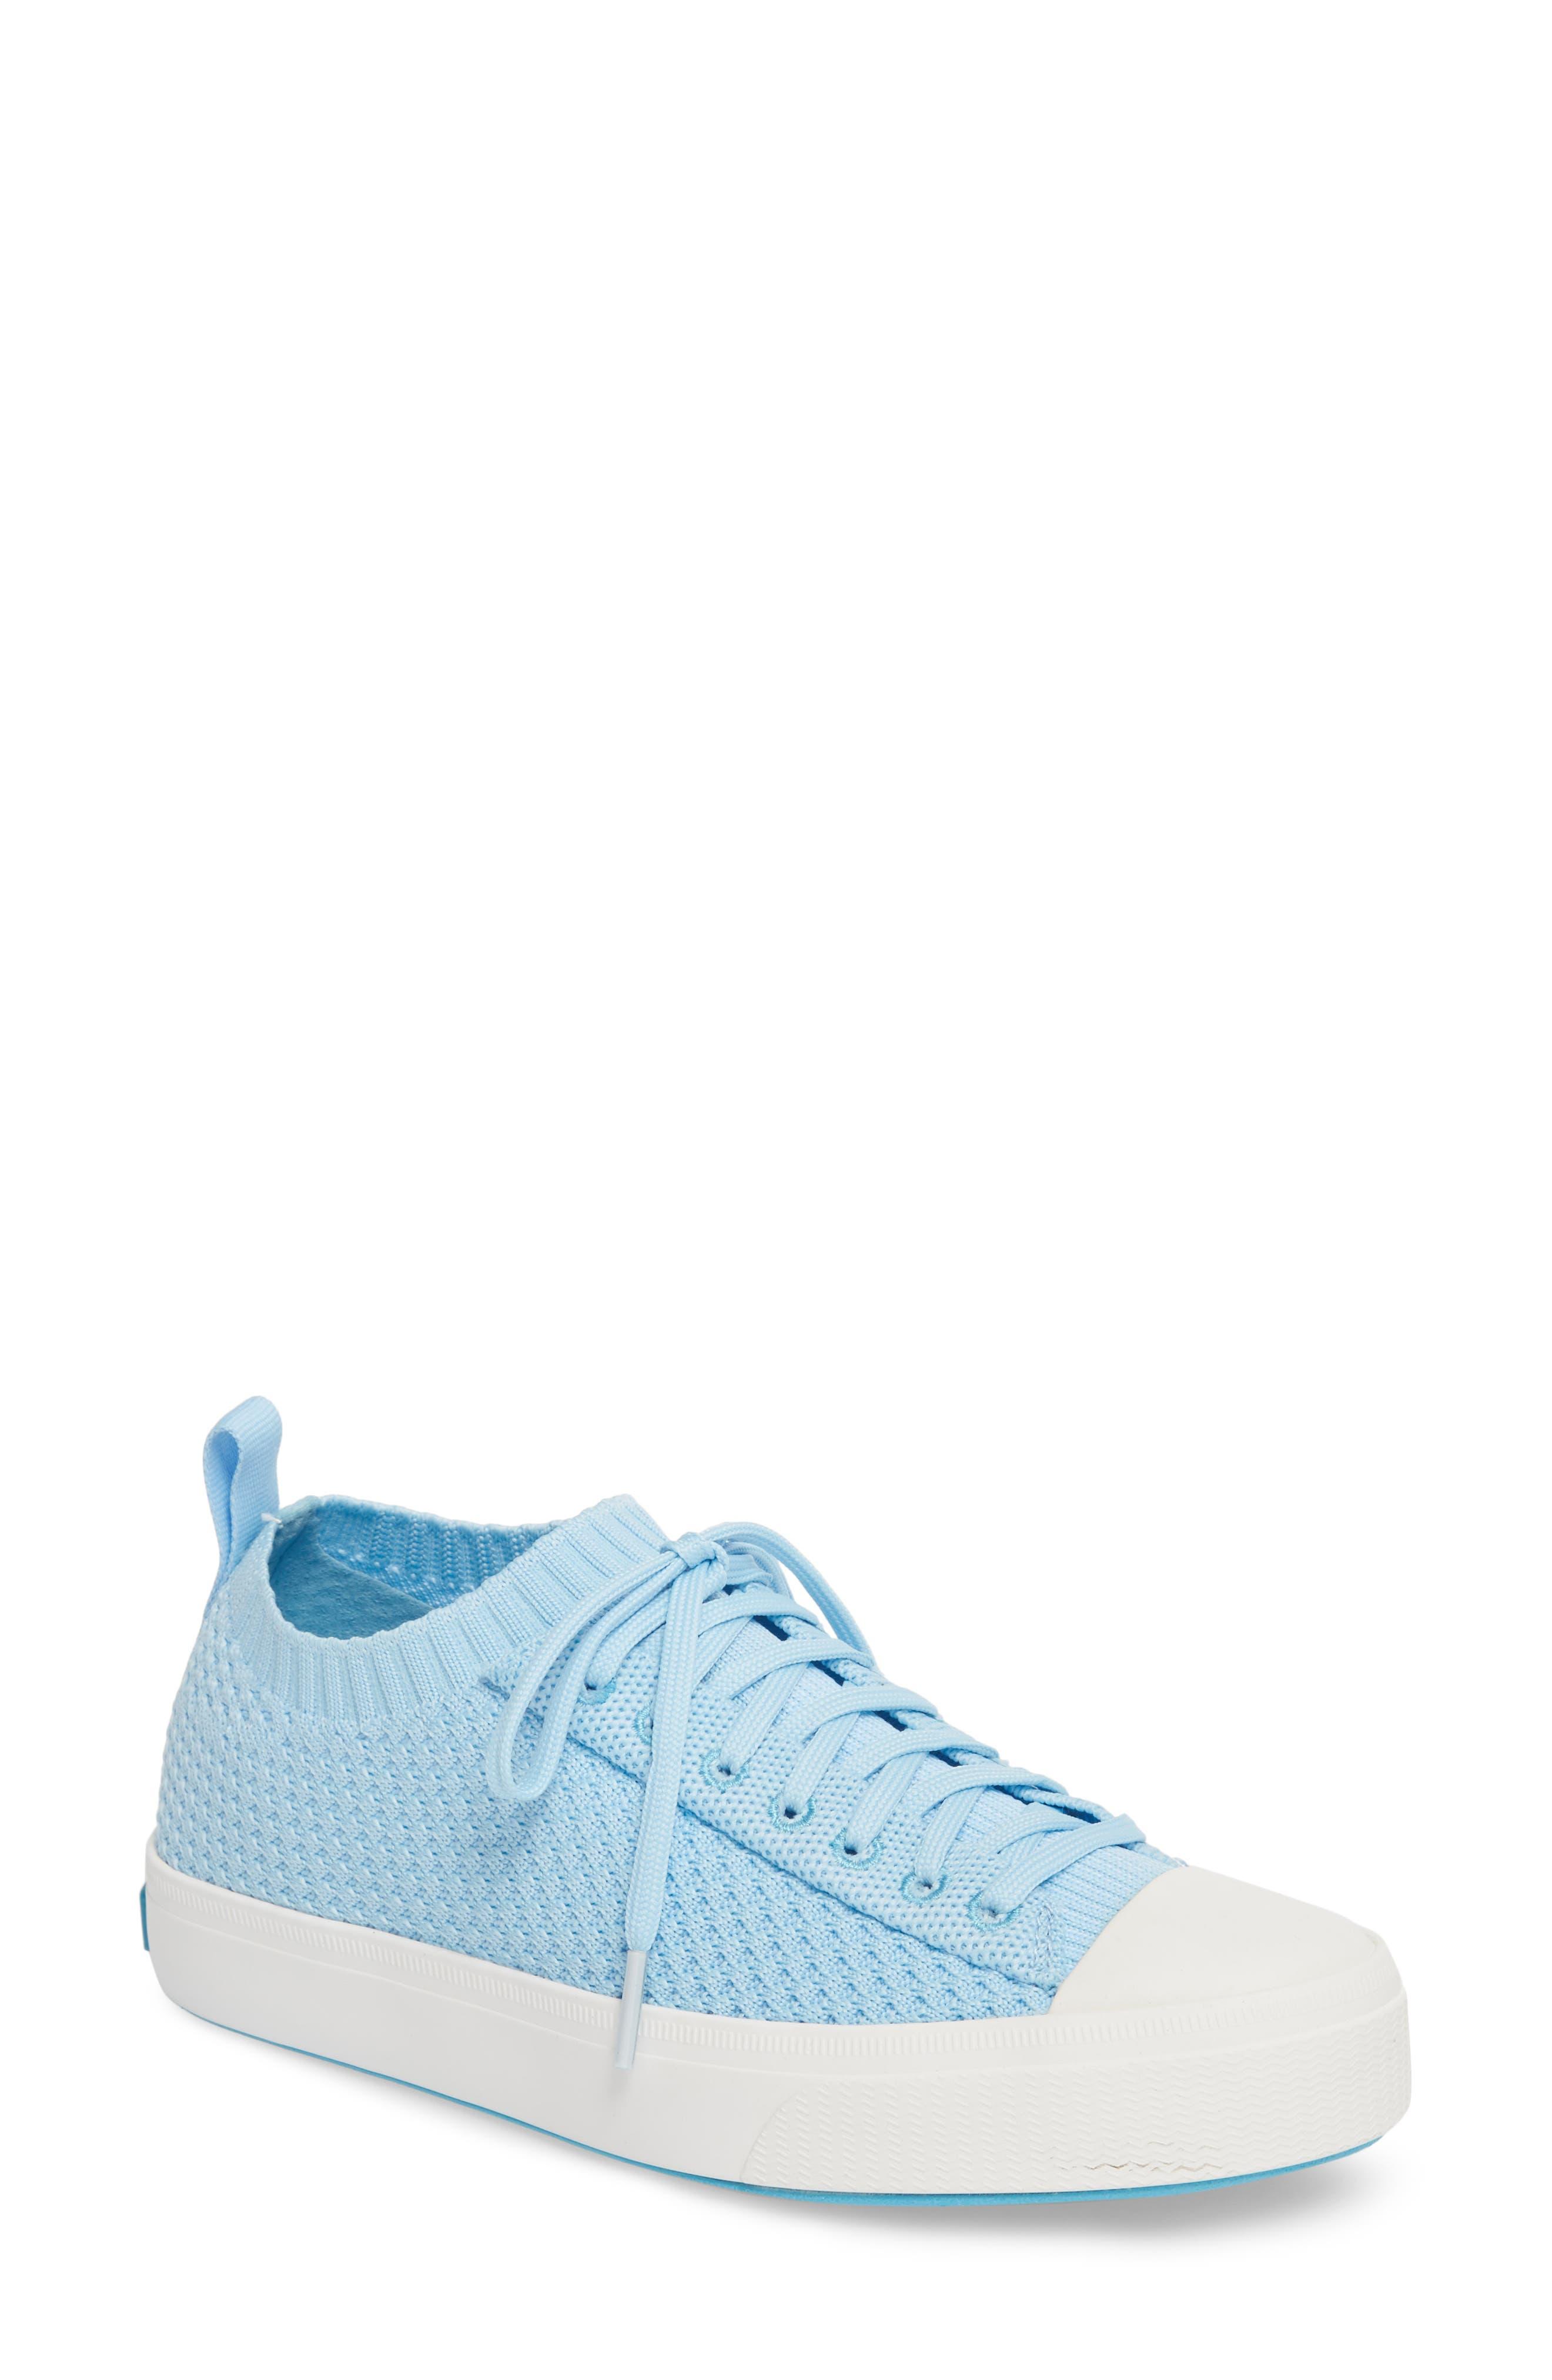 Jefferson 2.0 Liteknit Sneaker,                             Main thumbnail 1, color,                             Sky Blue/ Shell White